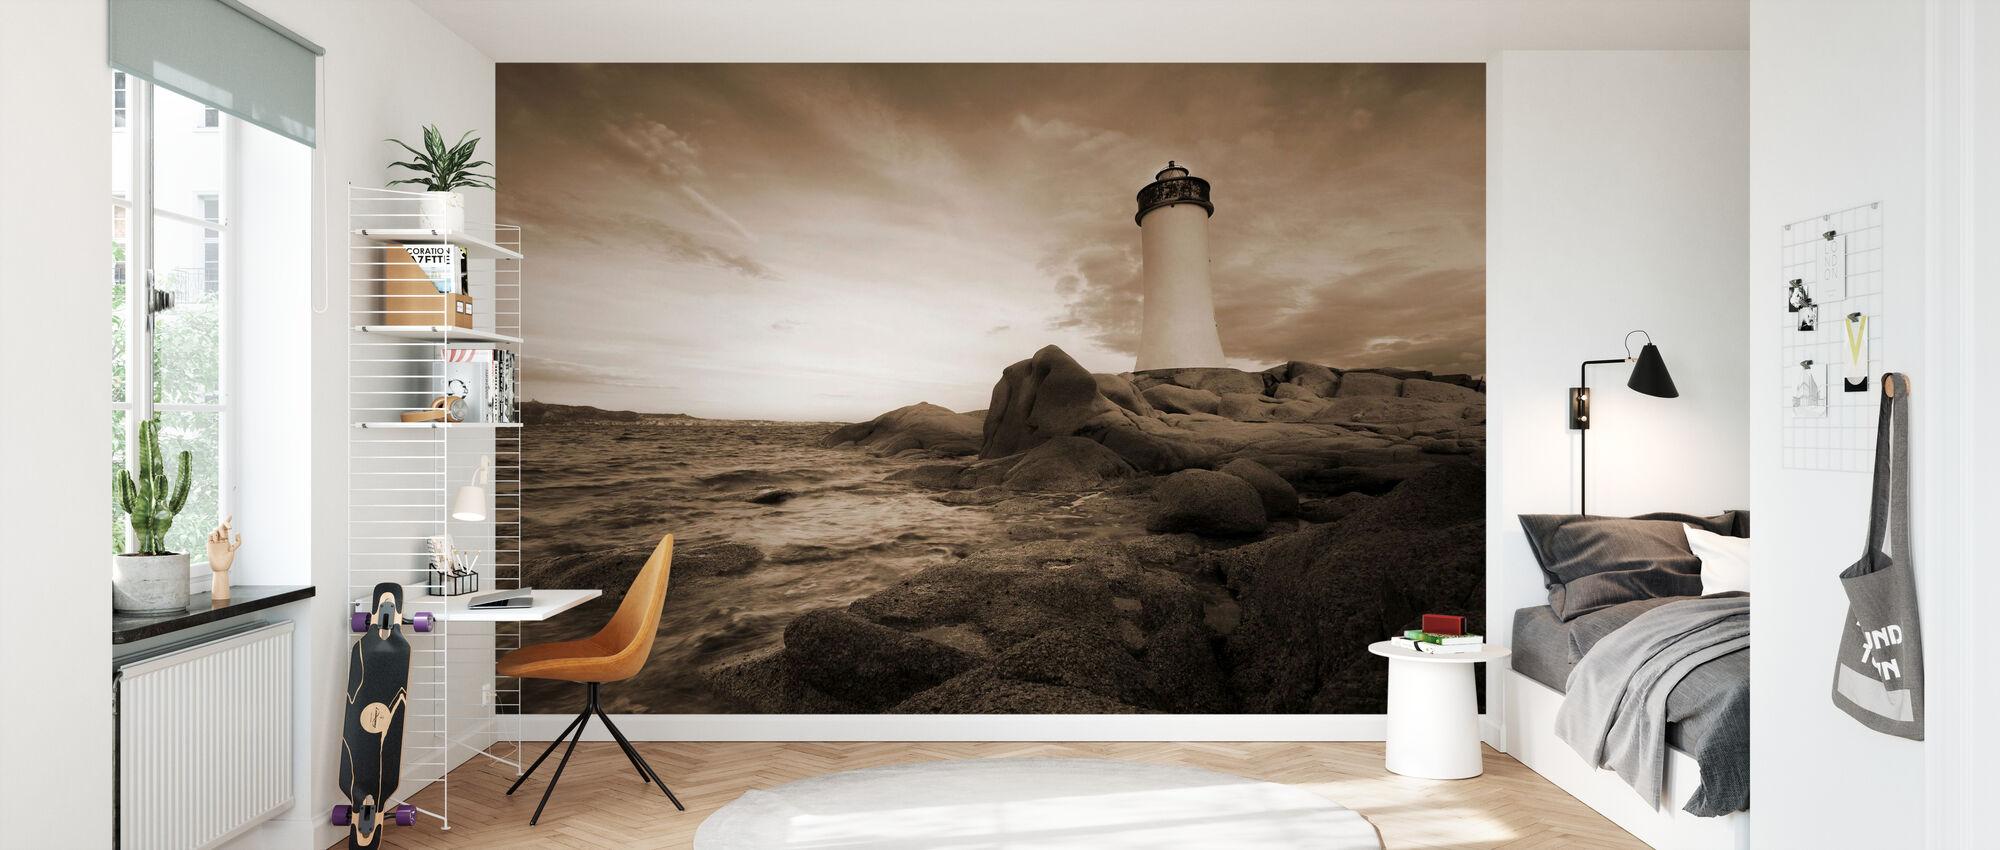 Sardinia Lighthouse - Wallpaper - Kids Room